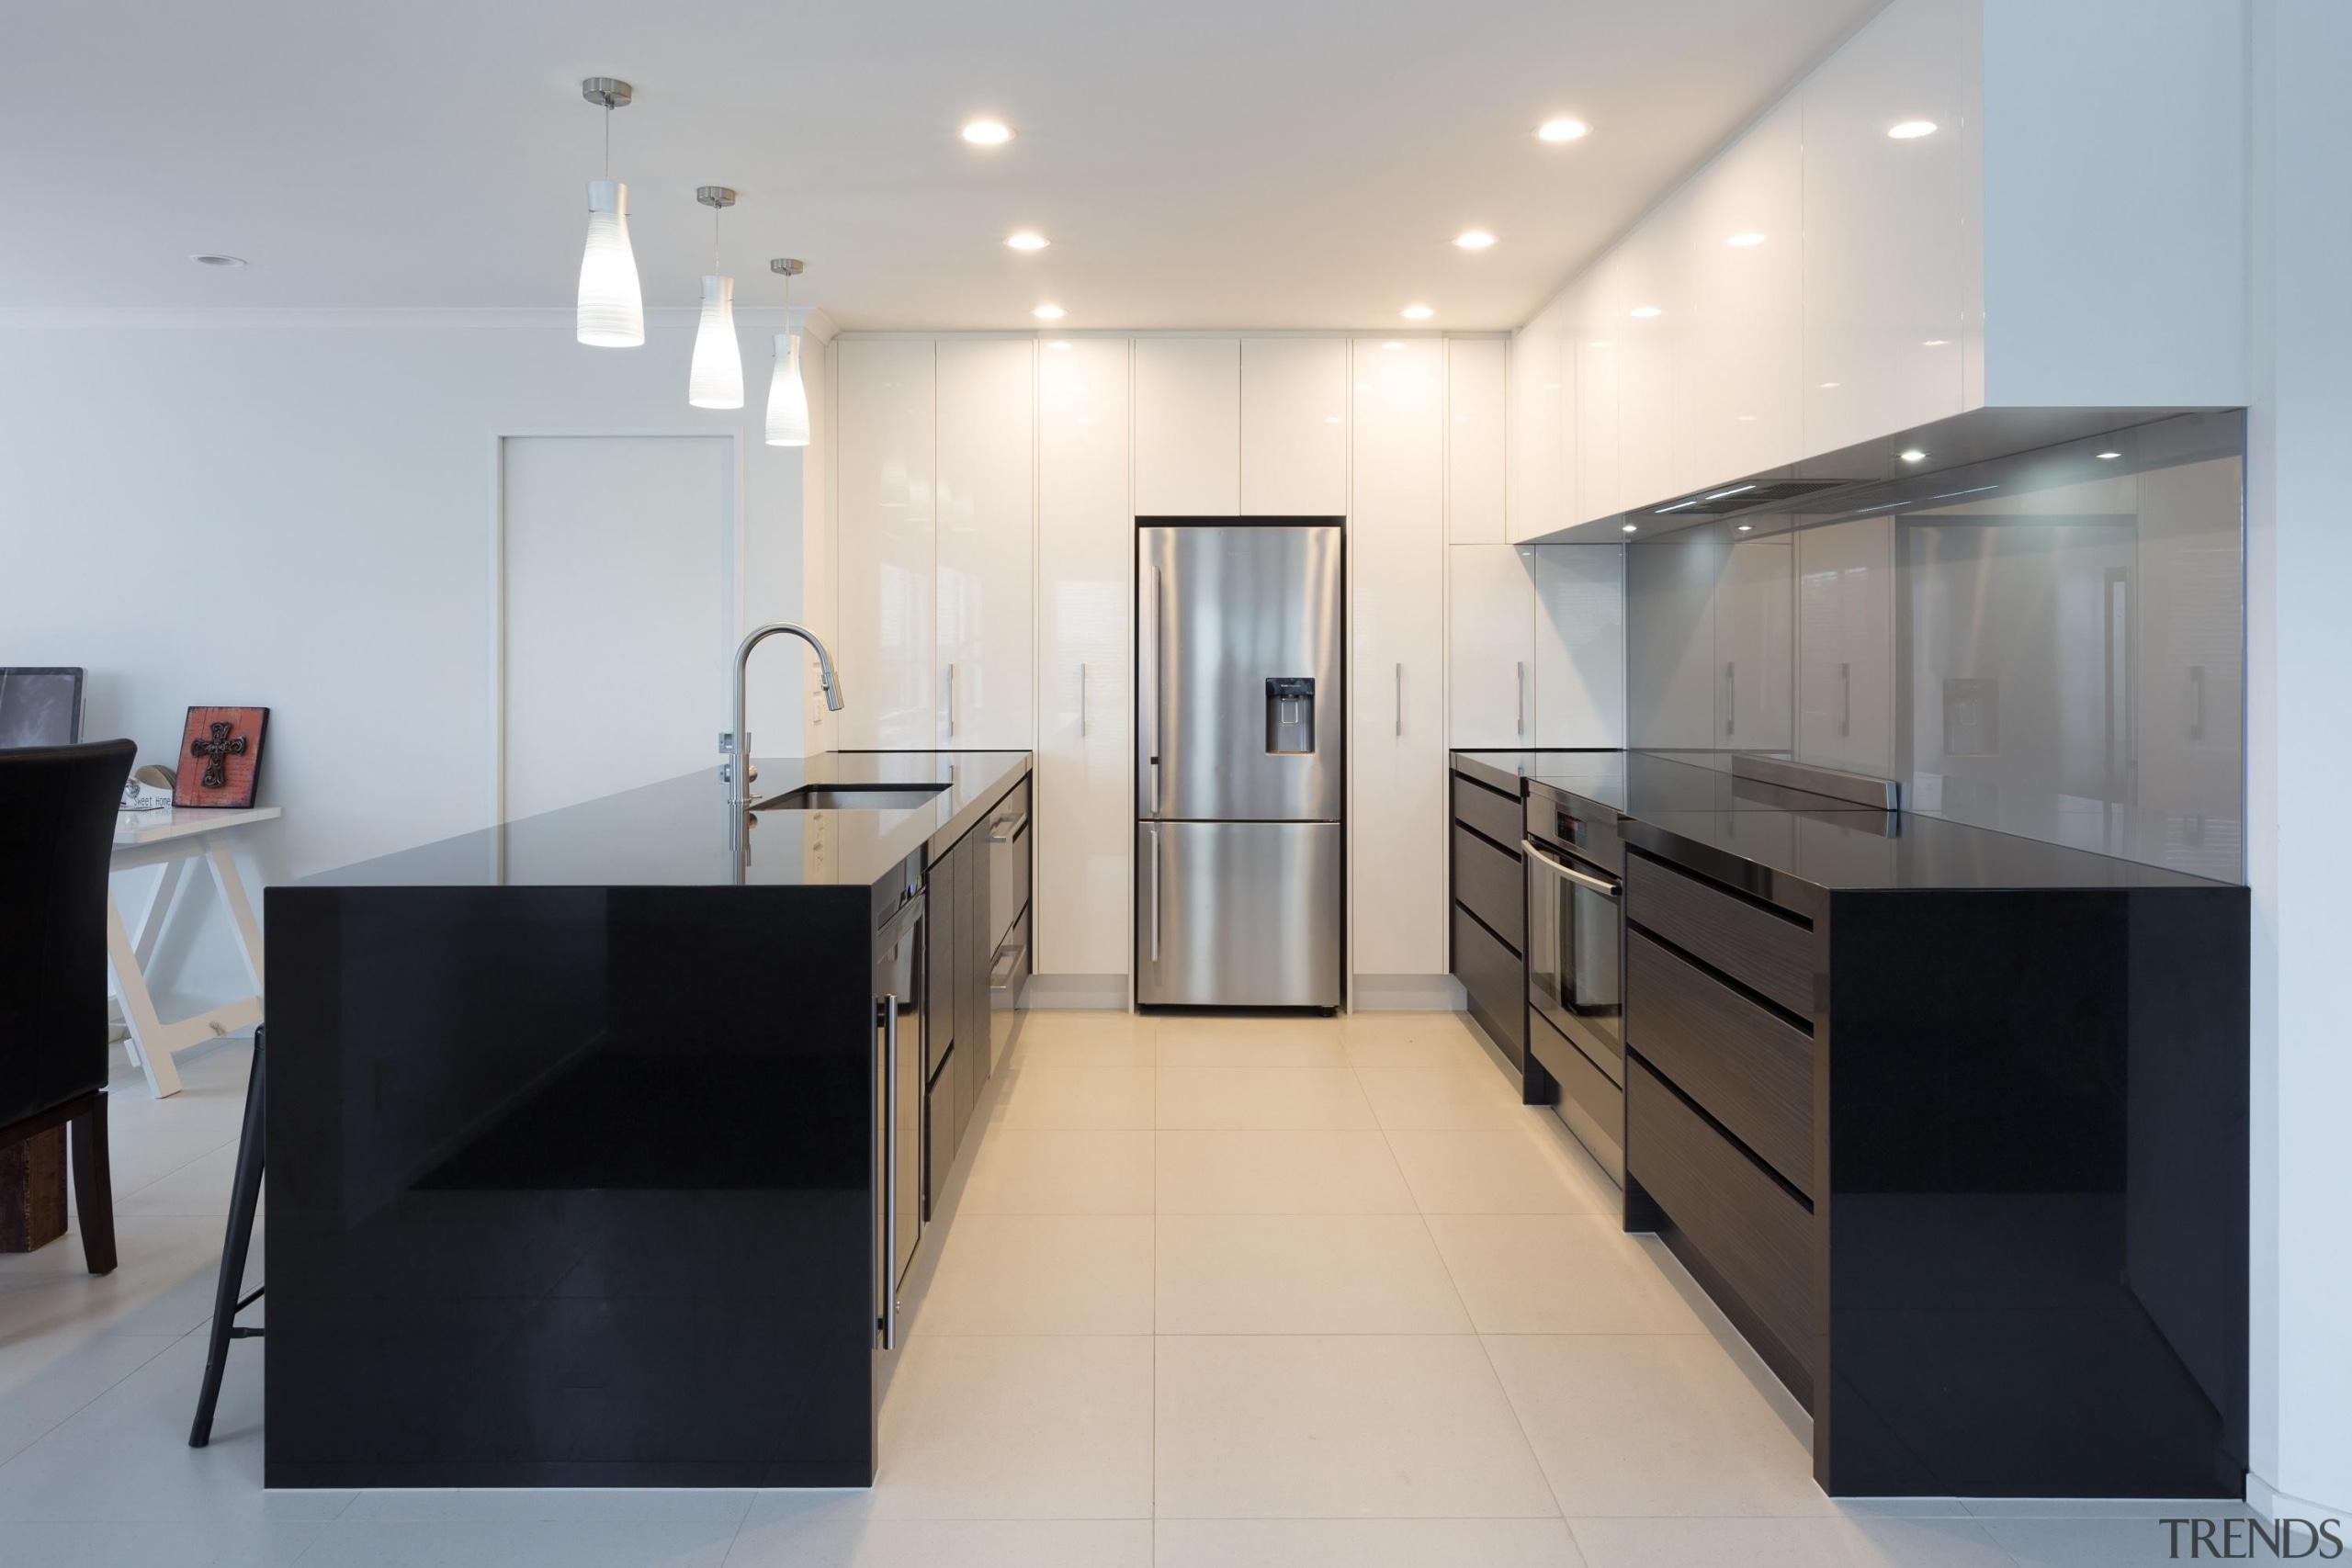 black granite, glass splashback, designatek gloss, designatek textured, architecture, cabinetry, countertop, floor, interior design, kitchen, product design, real estate, room, gray